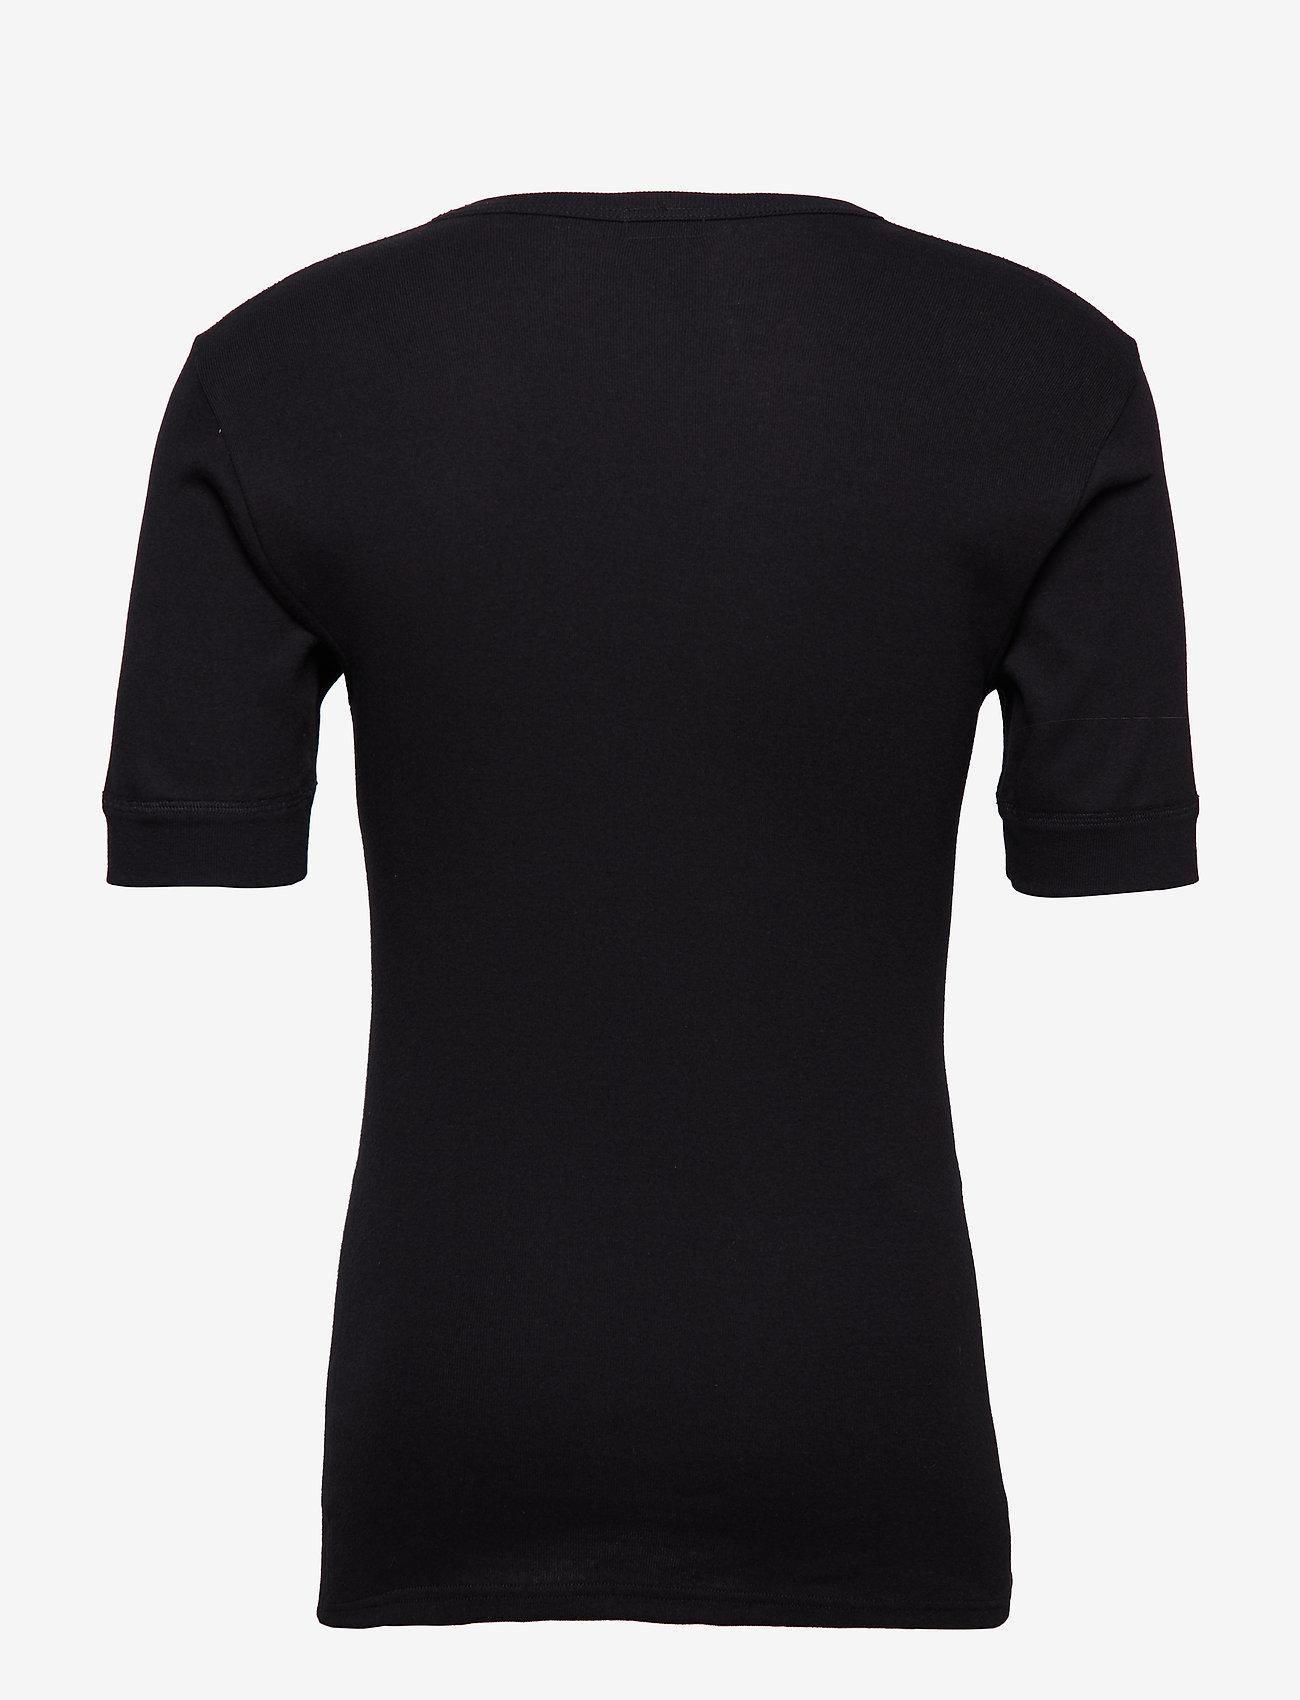 JBS - Original tee - basic t-shirts - black